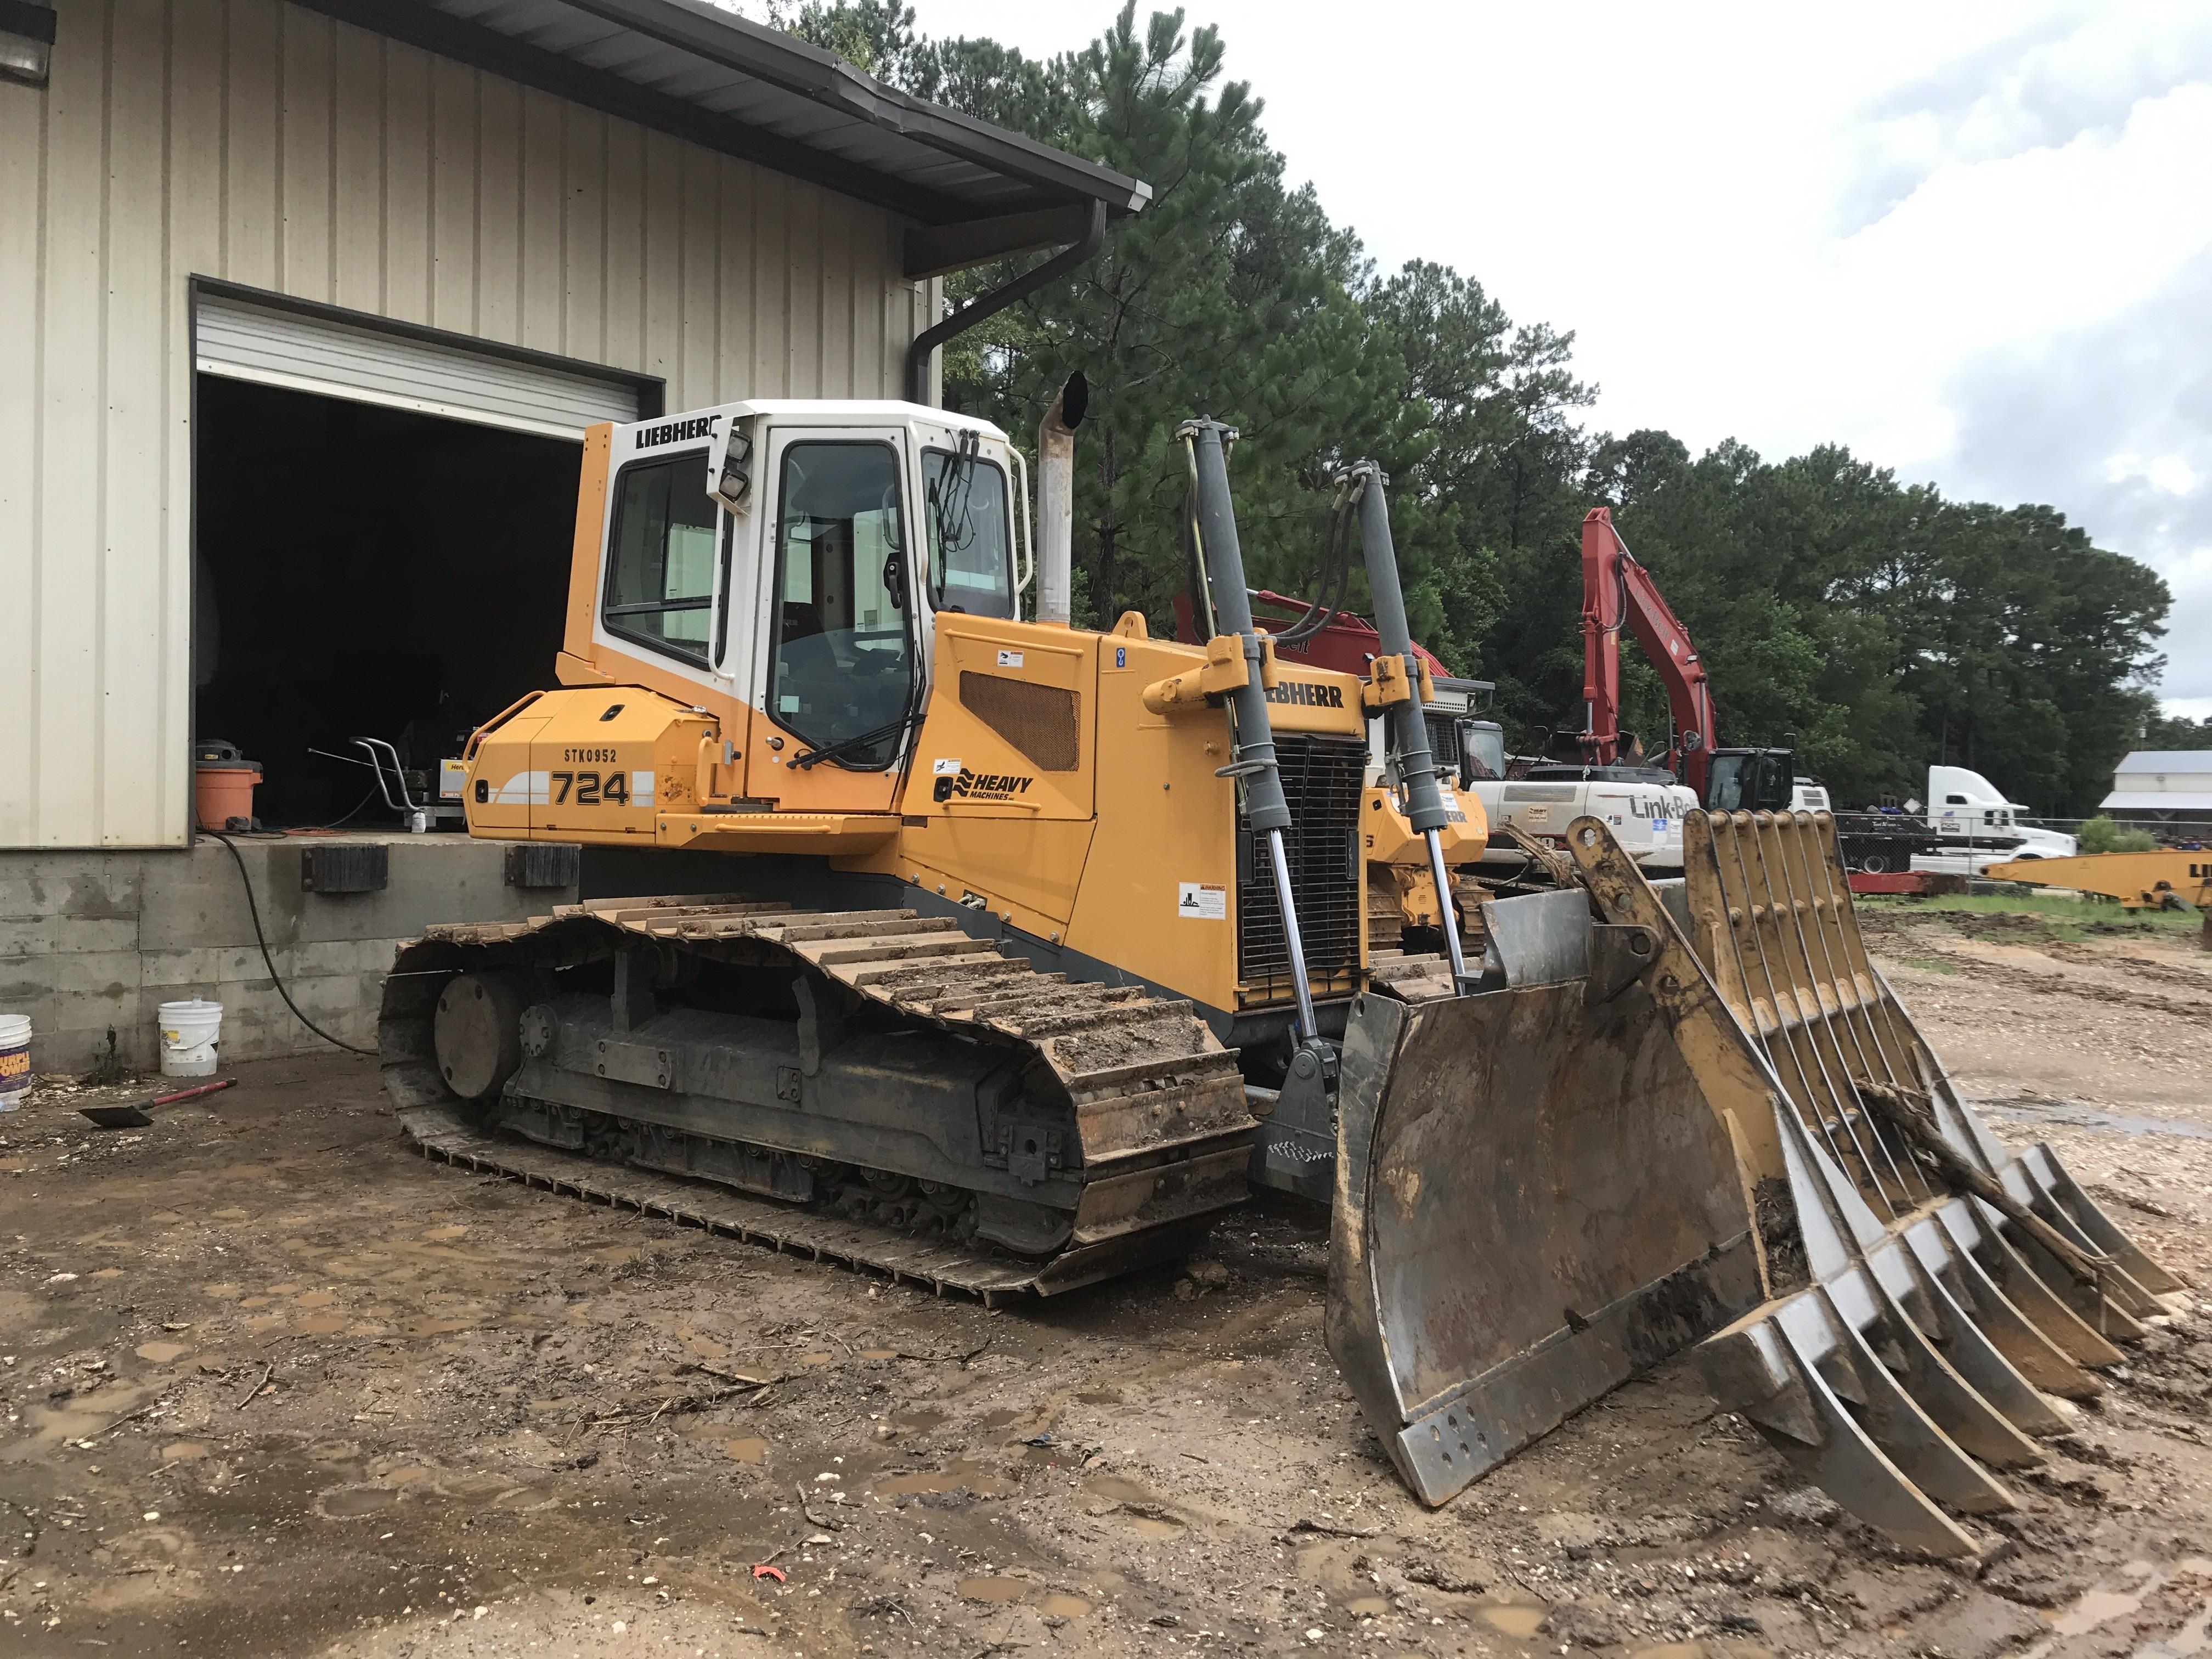 Heavy Construction & Forestry Equipment | TN, GA, ME, AL, LA